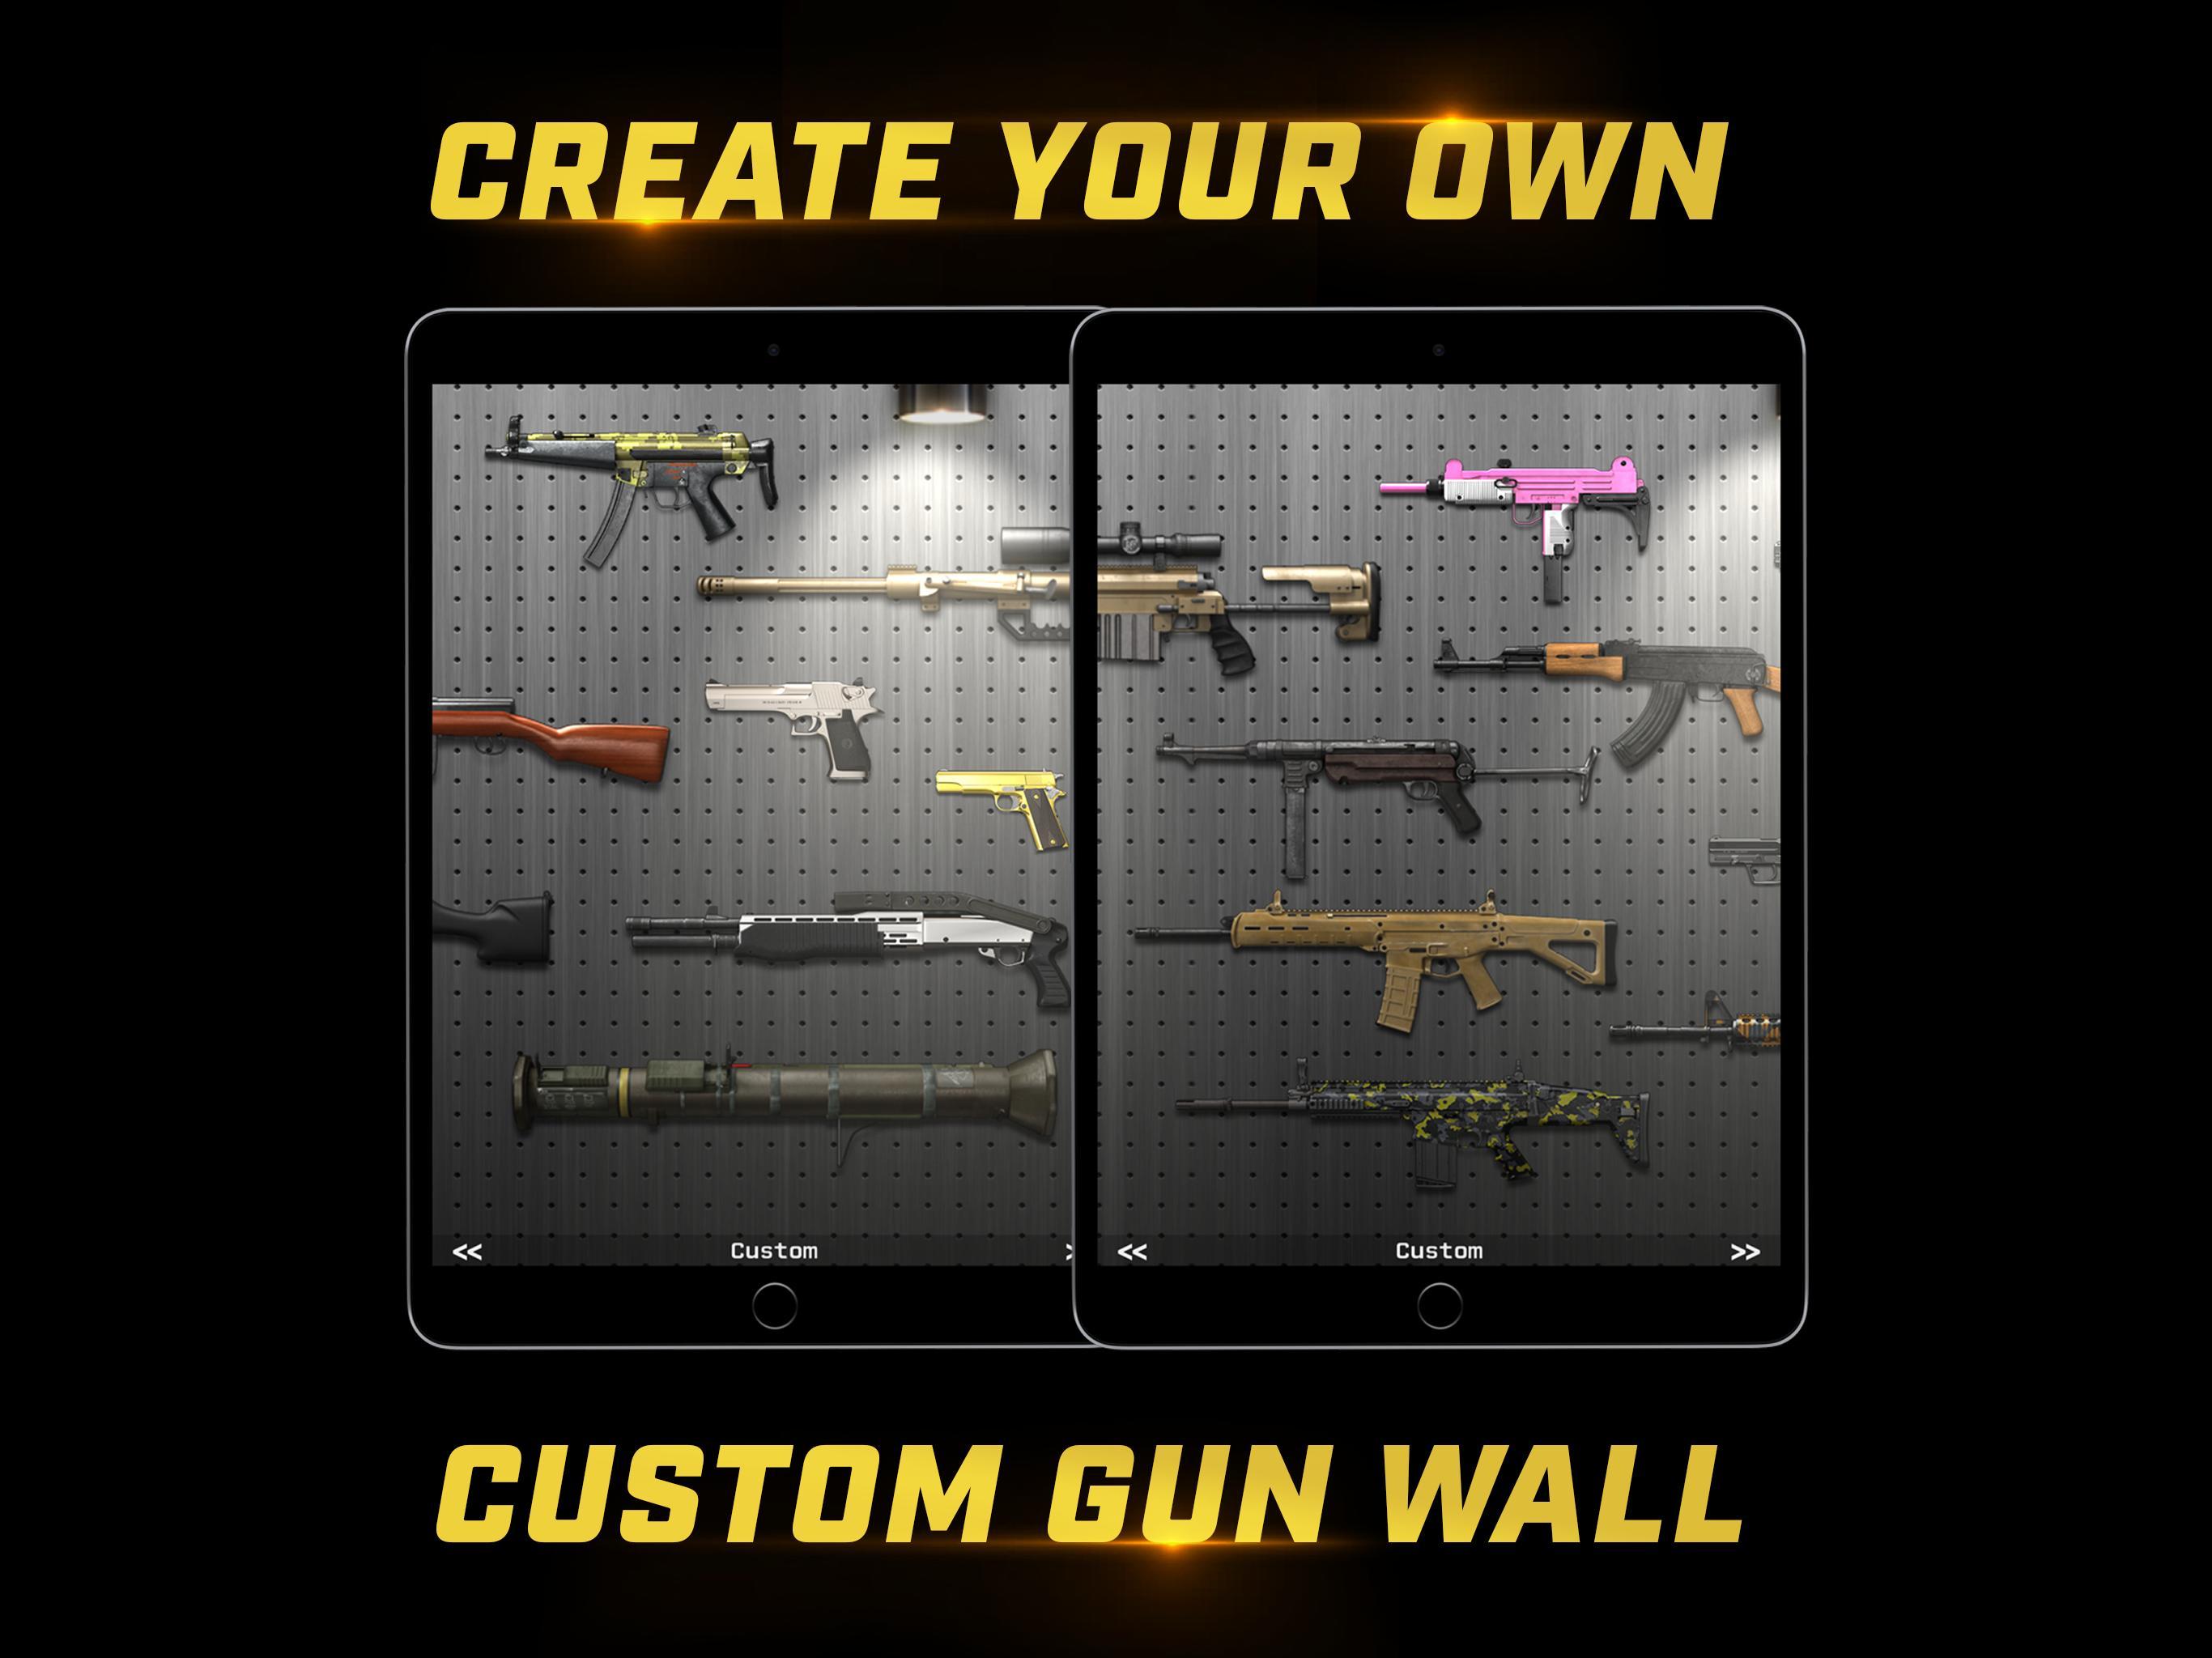 iGun Pro The Original Gun App 5.26 Screenshot 15